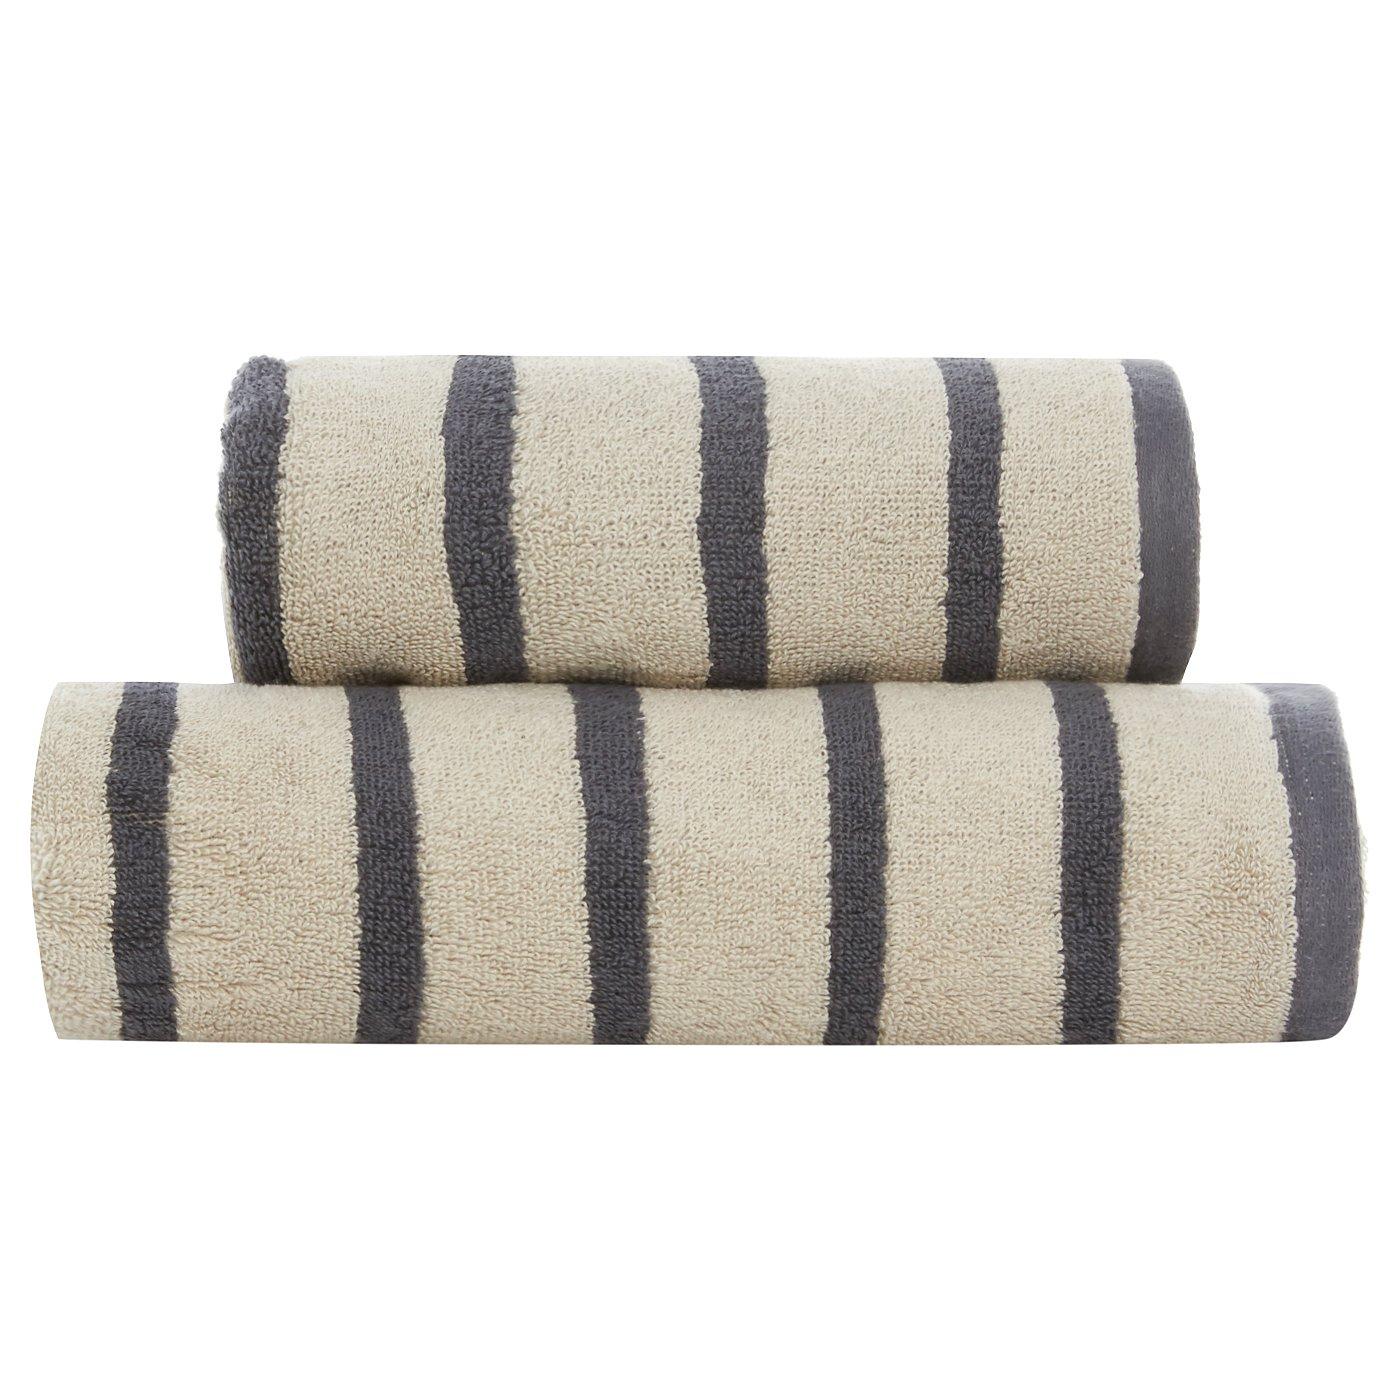 George Home 100% Cotton Towel Range - Grey Stripe. Loading zoom